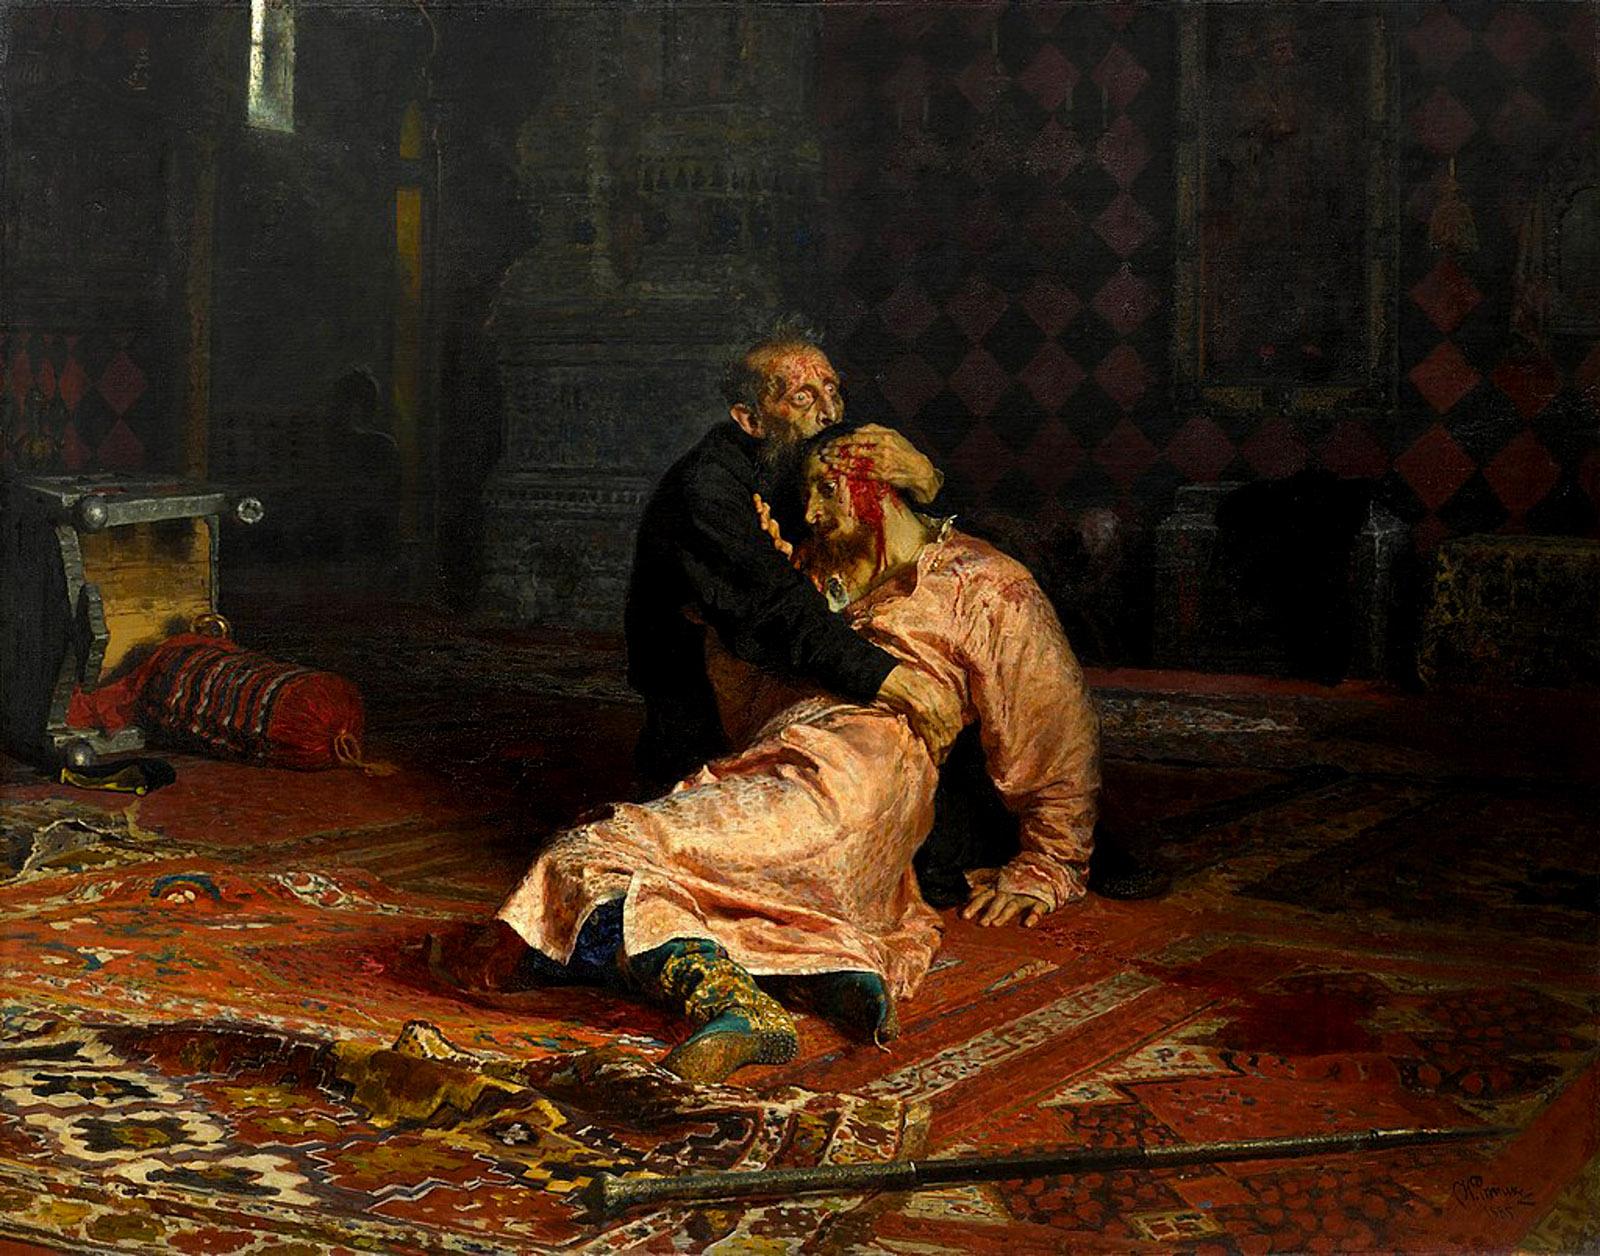 Ilya Repin: Ivan the Terrible and His Son Ivan, 1885